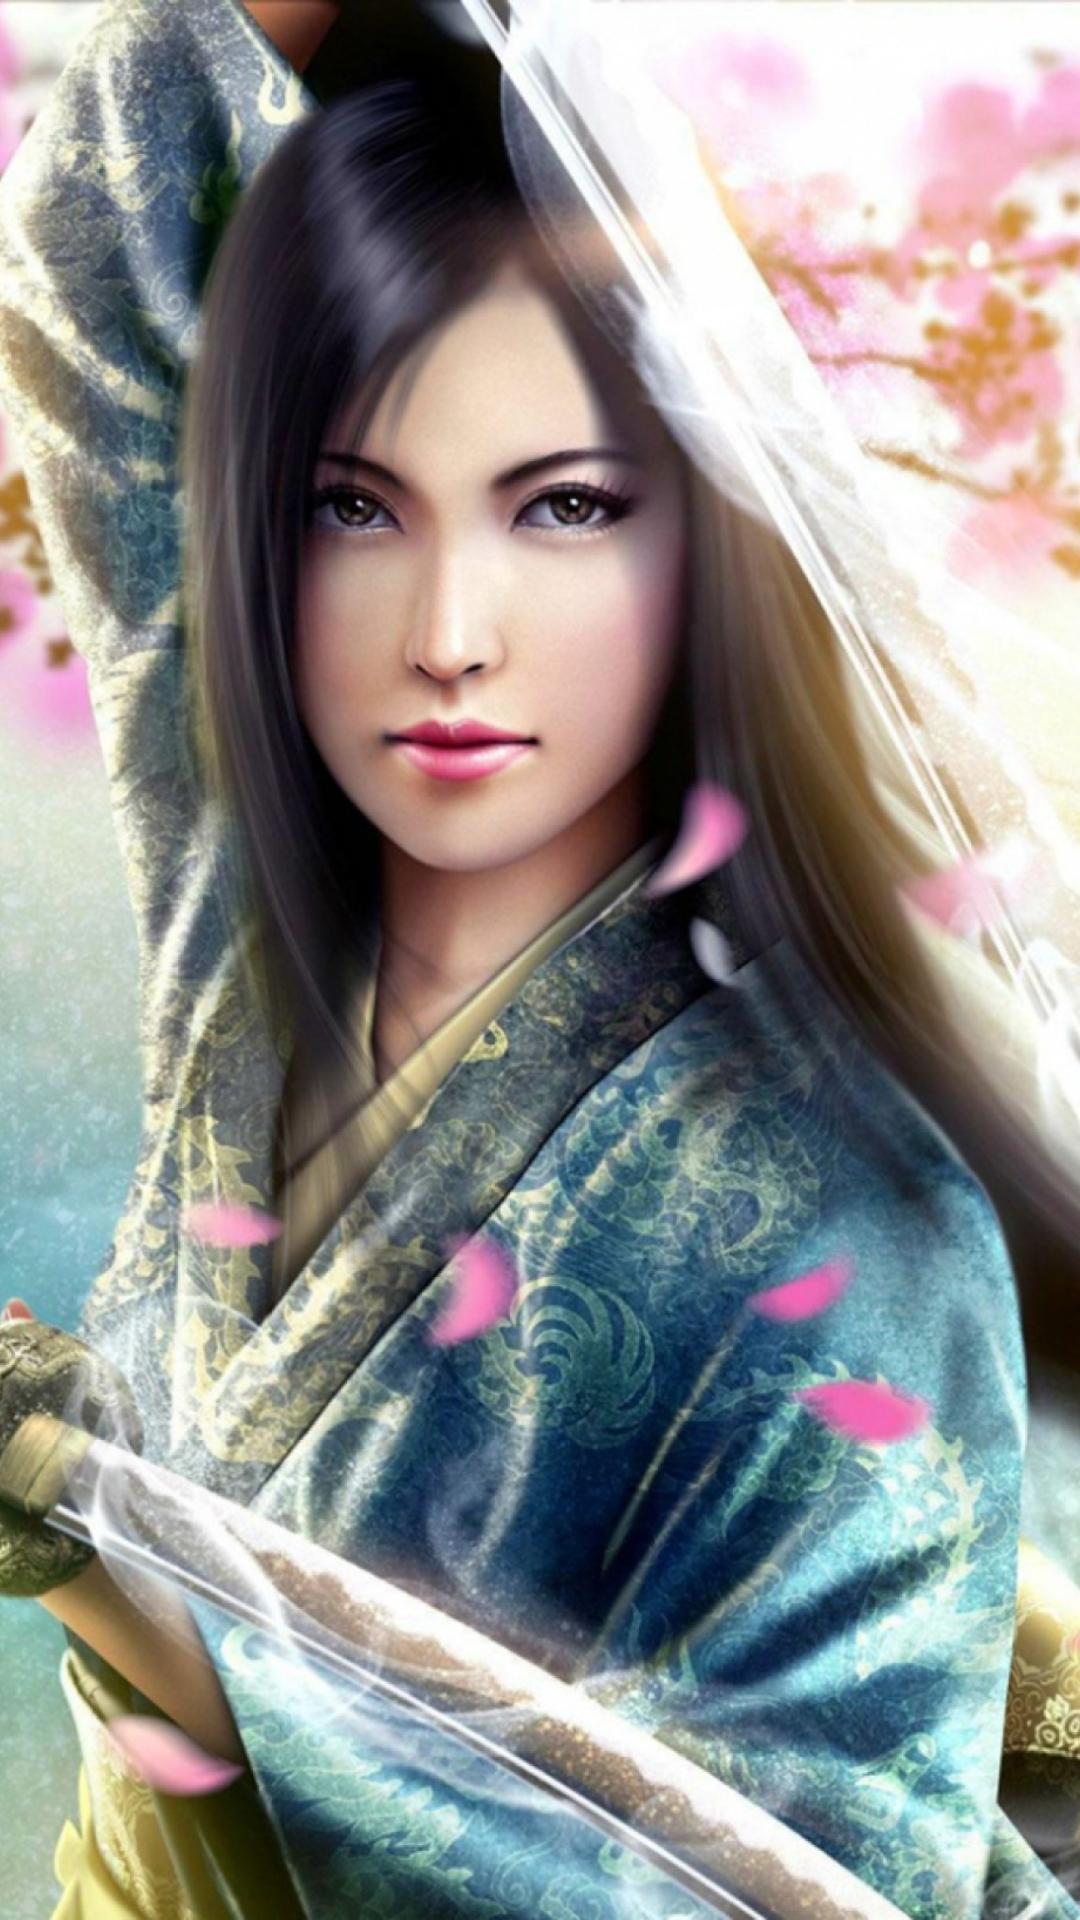 Pictures of girl samurai warriors — photo 7